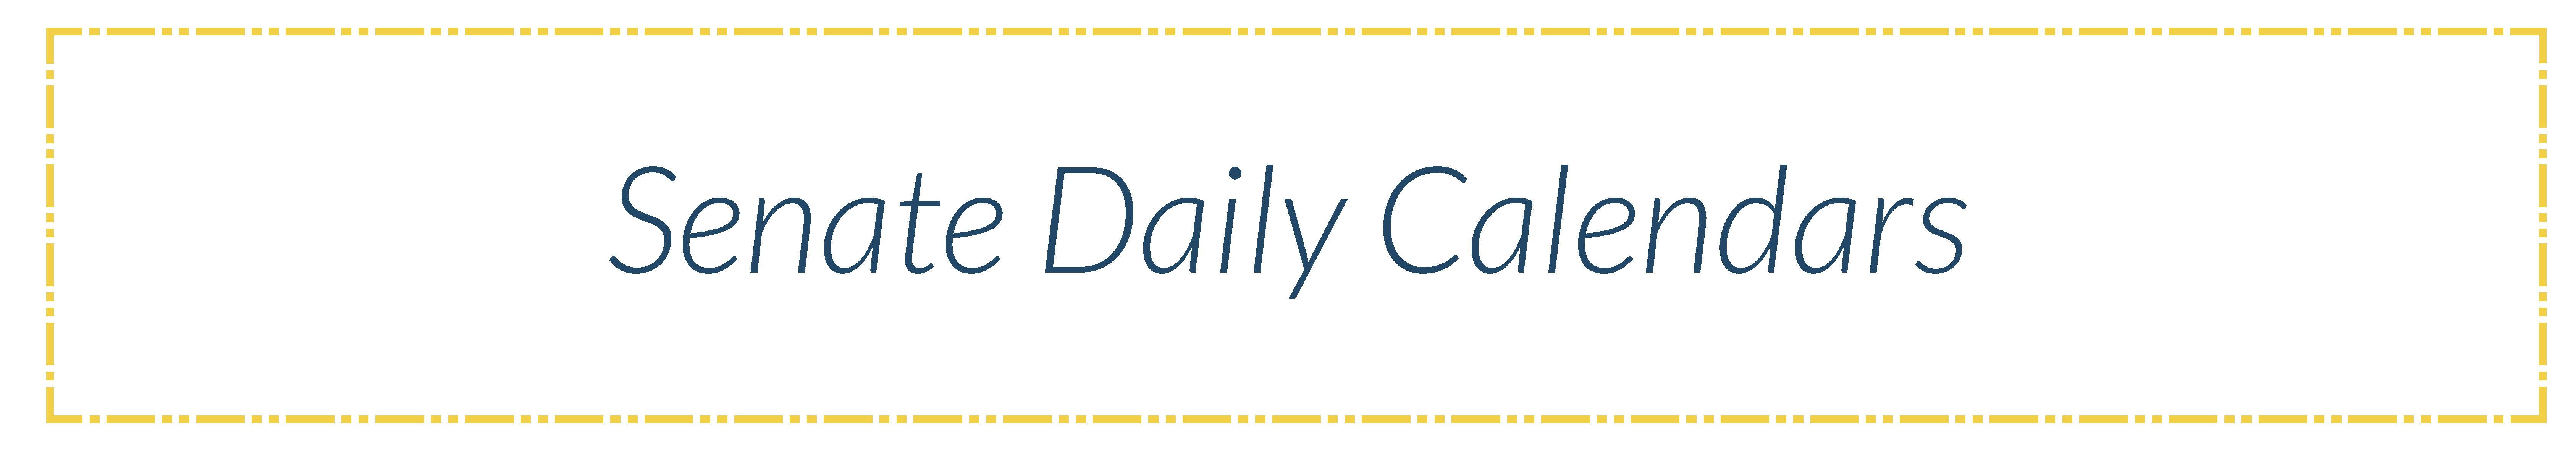 Senate Daily Calendars